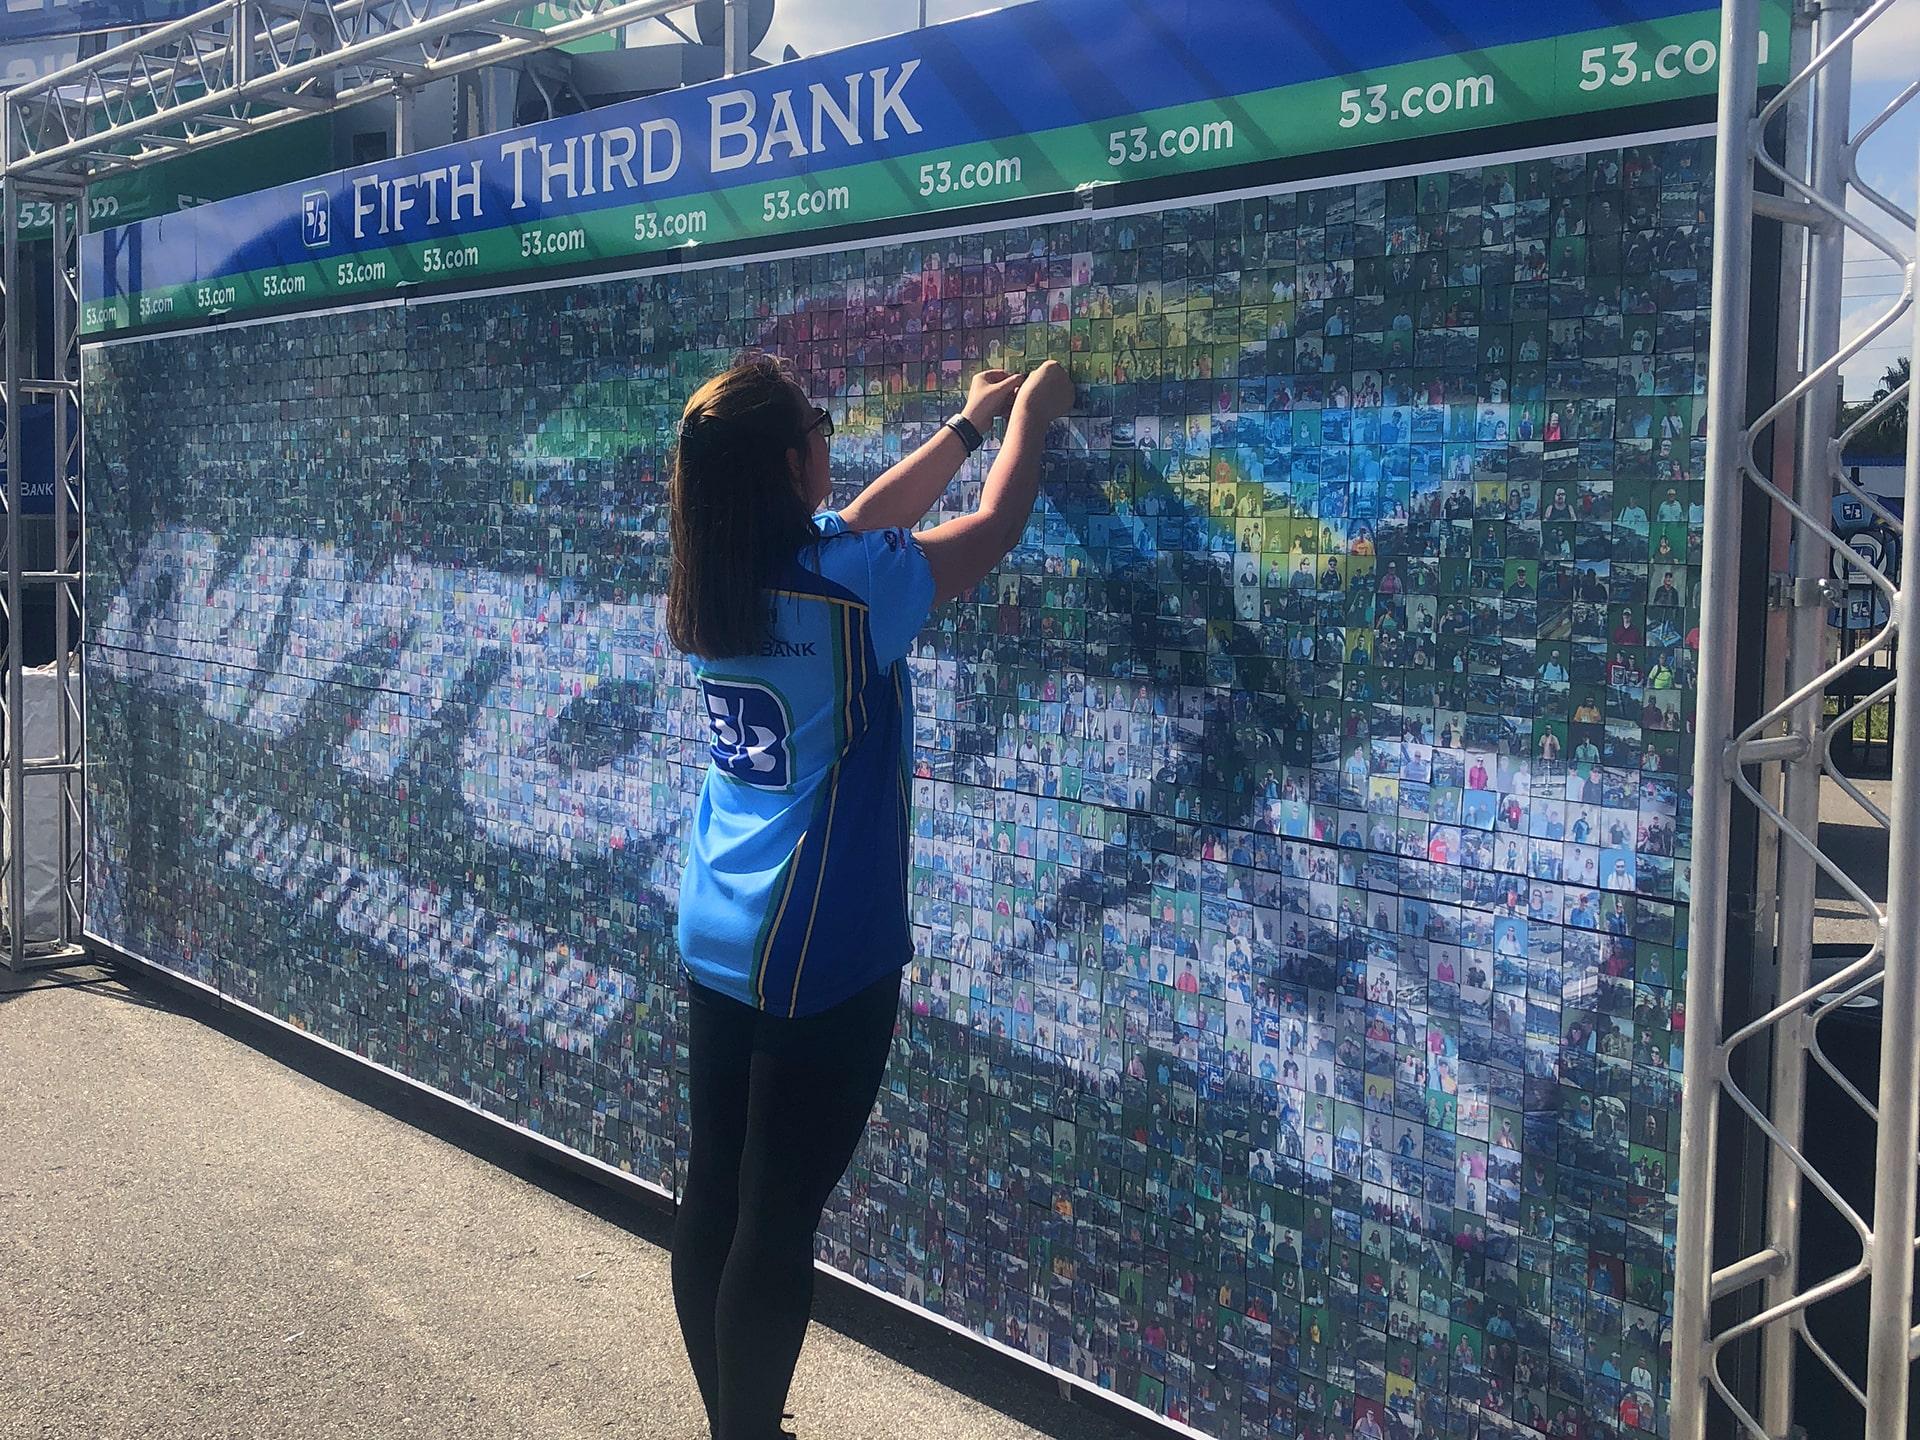 Live Event Mosaic: Daytona 500